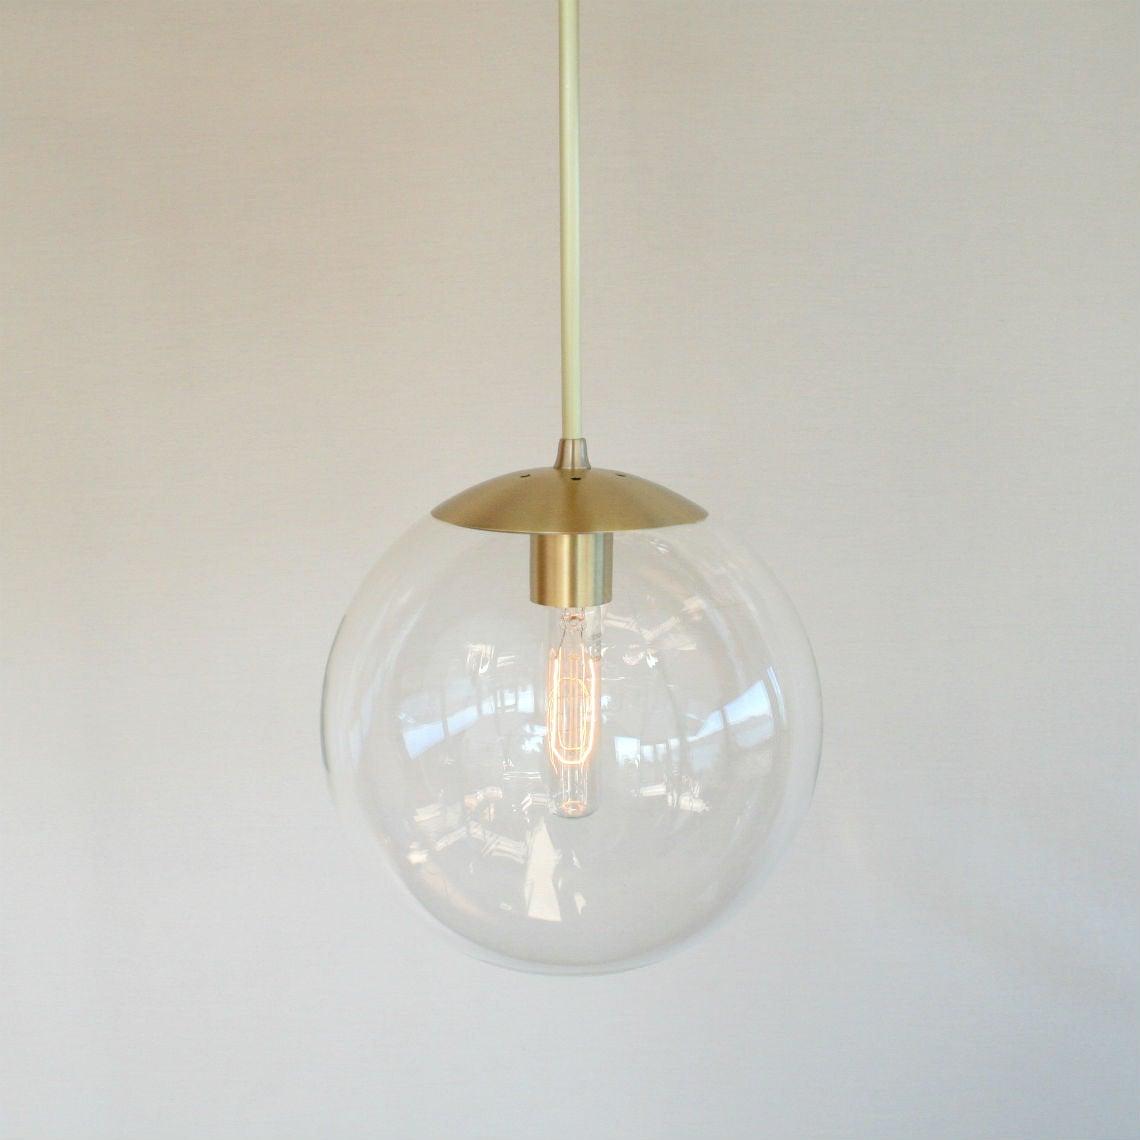 Orbiter 10 Pendant Light With Brass Stem Mid Century